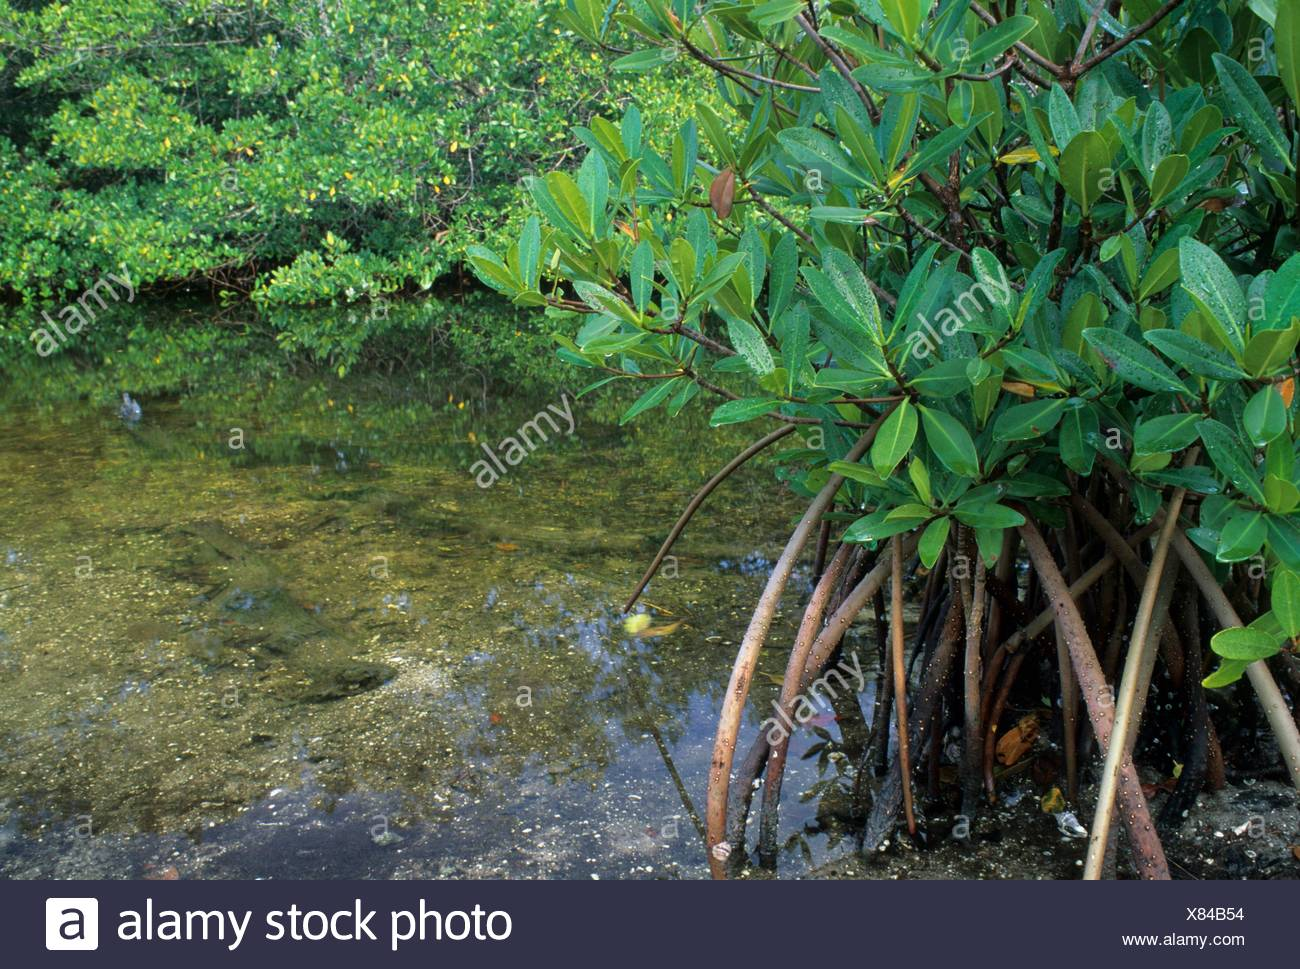 Red mangrove, JN Ding Darling National Wildlife Refuge, Florida. - Stock Image